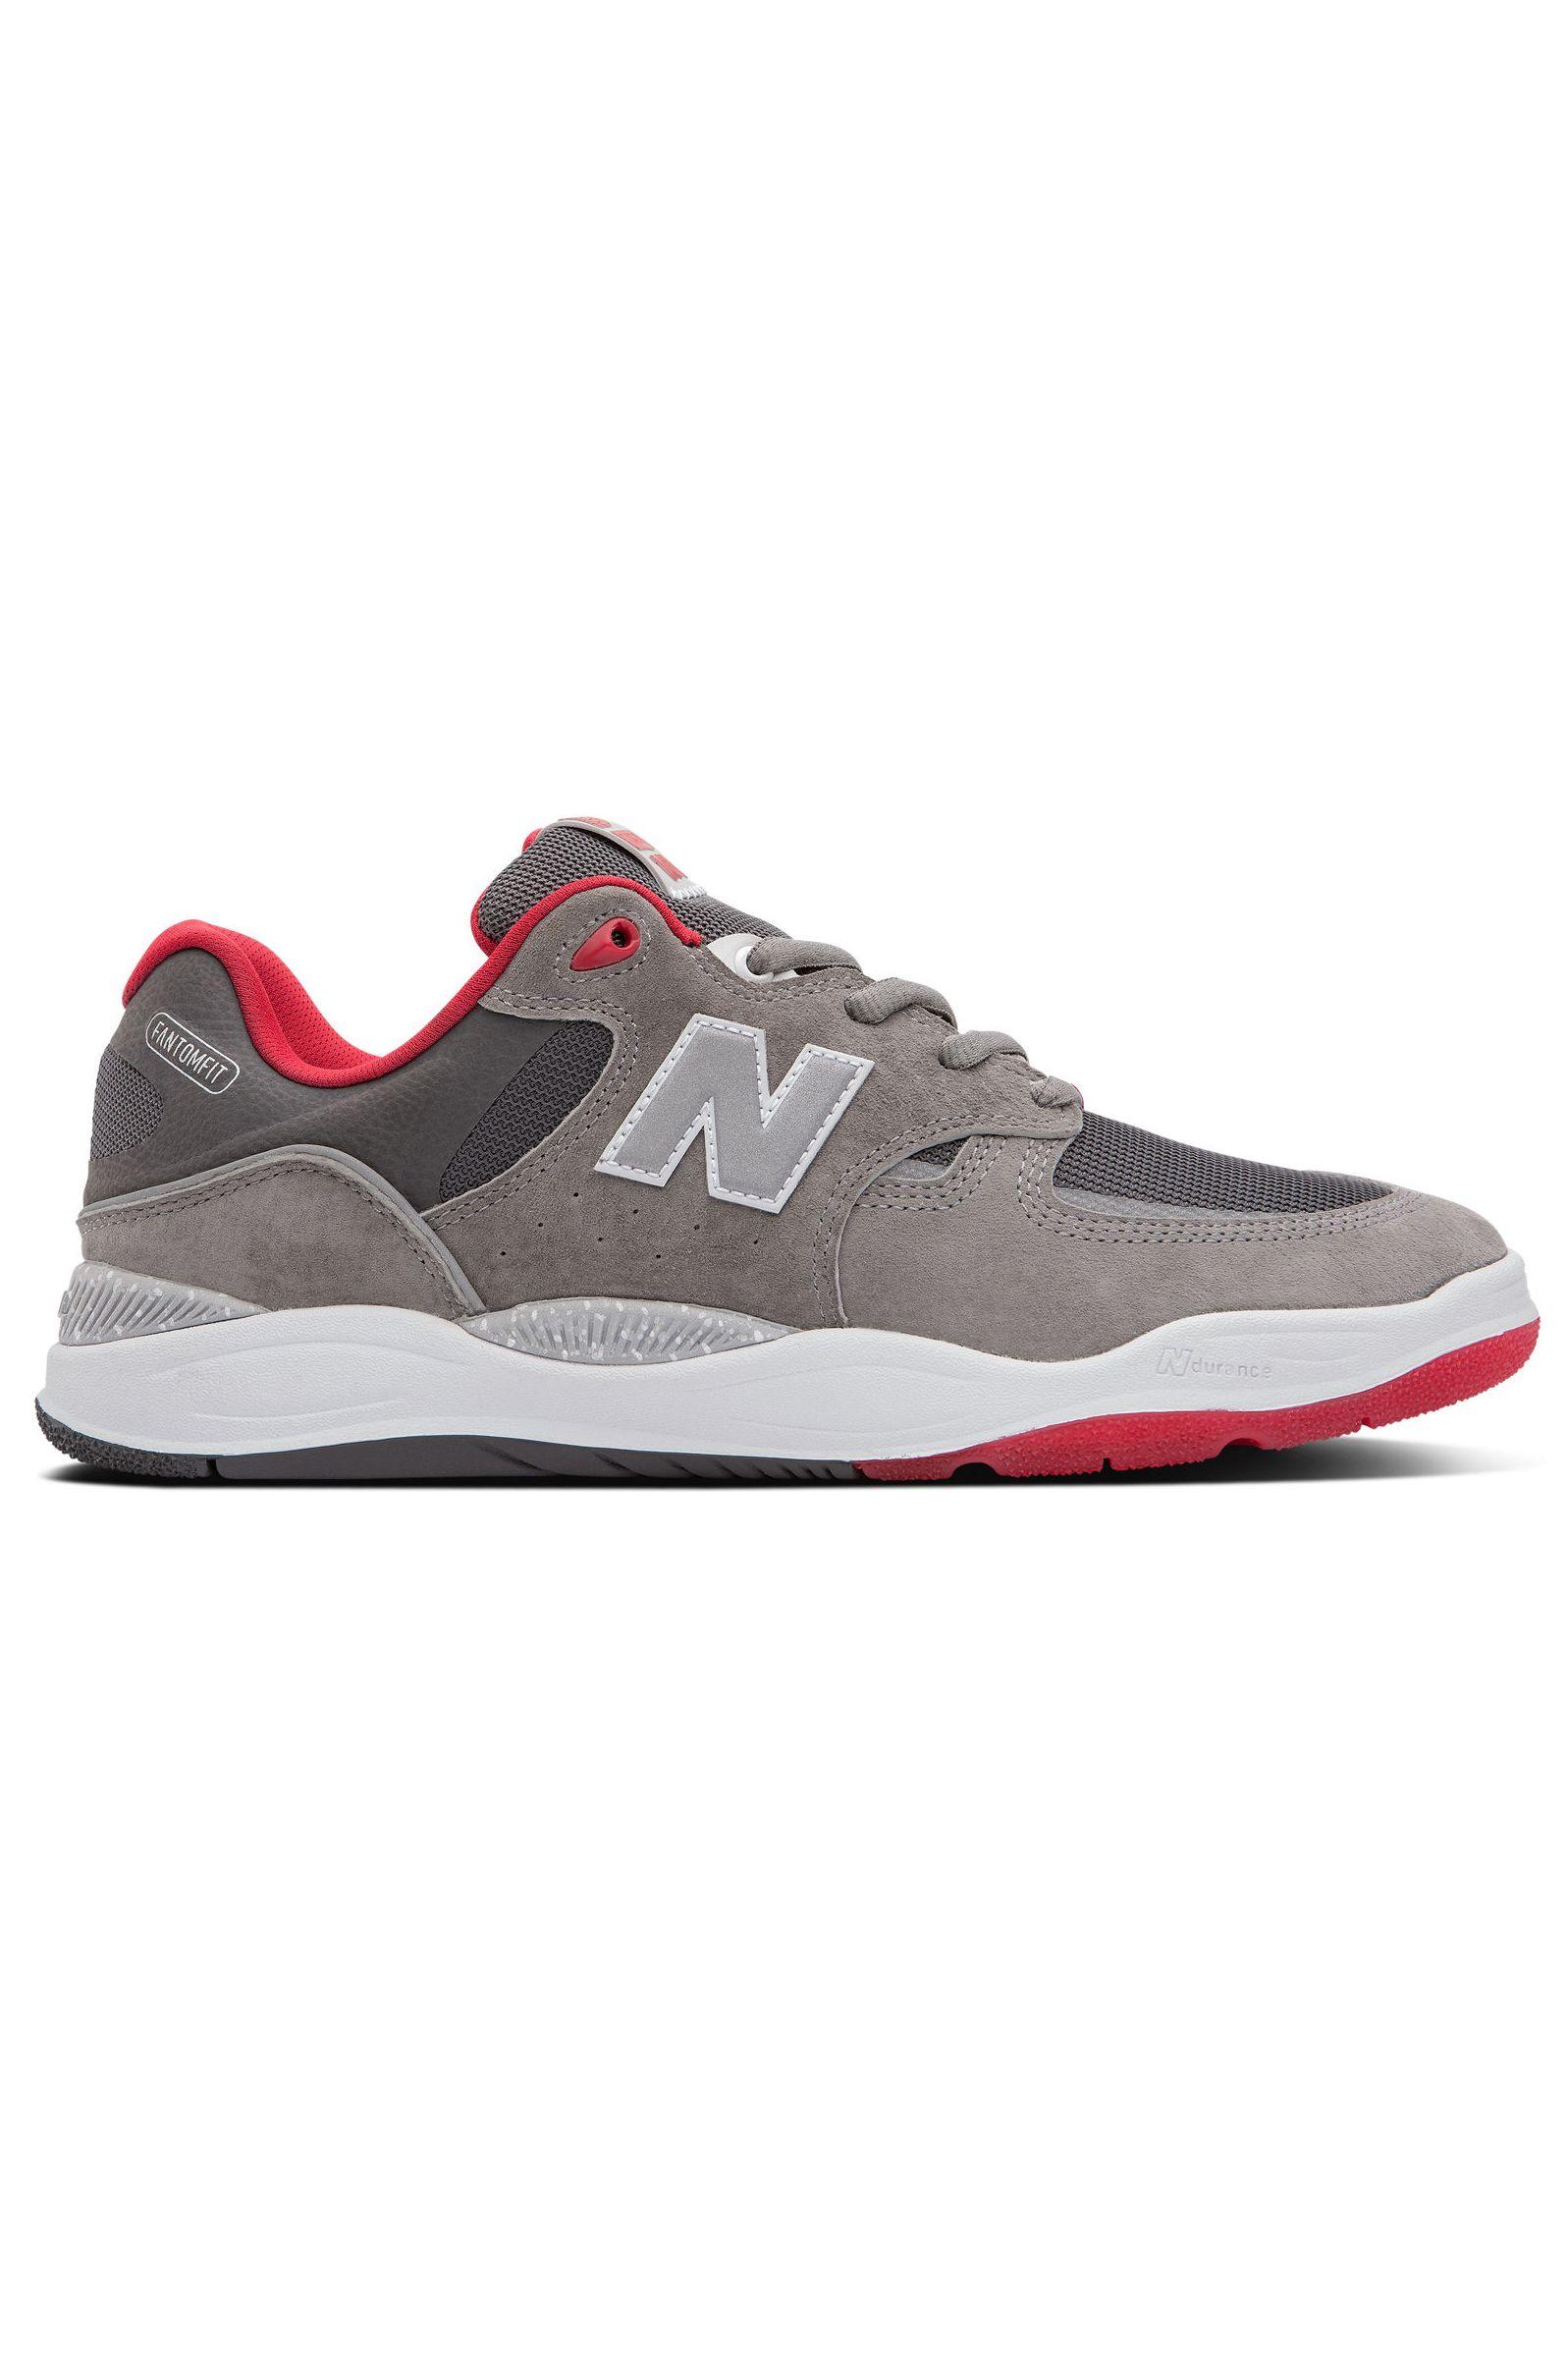 Tenis New Balance NM1010 Marblehead